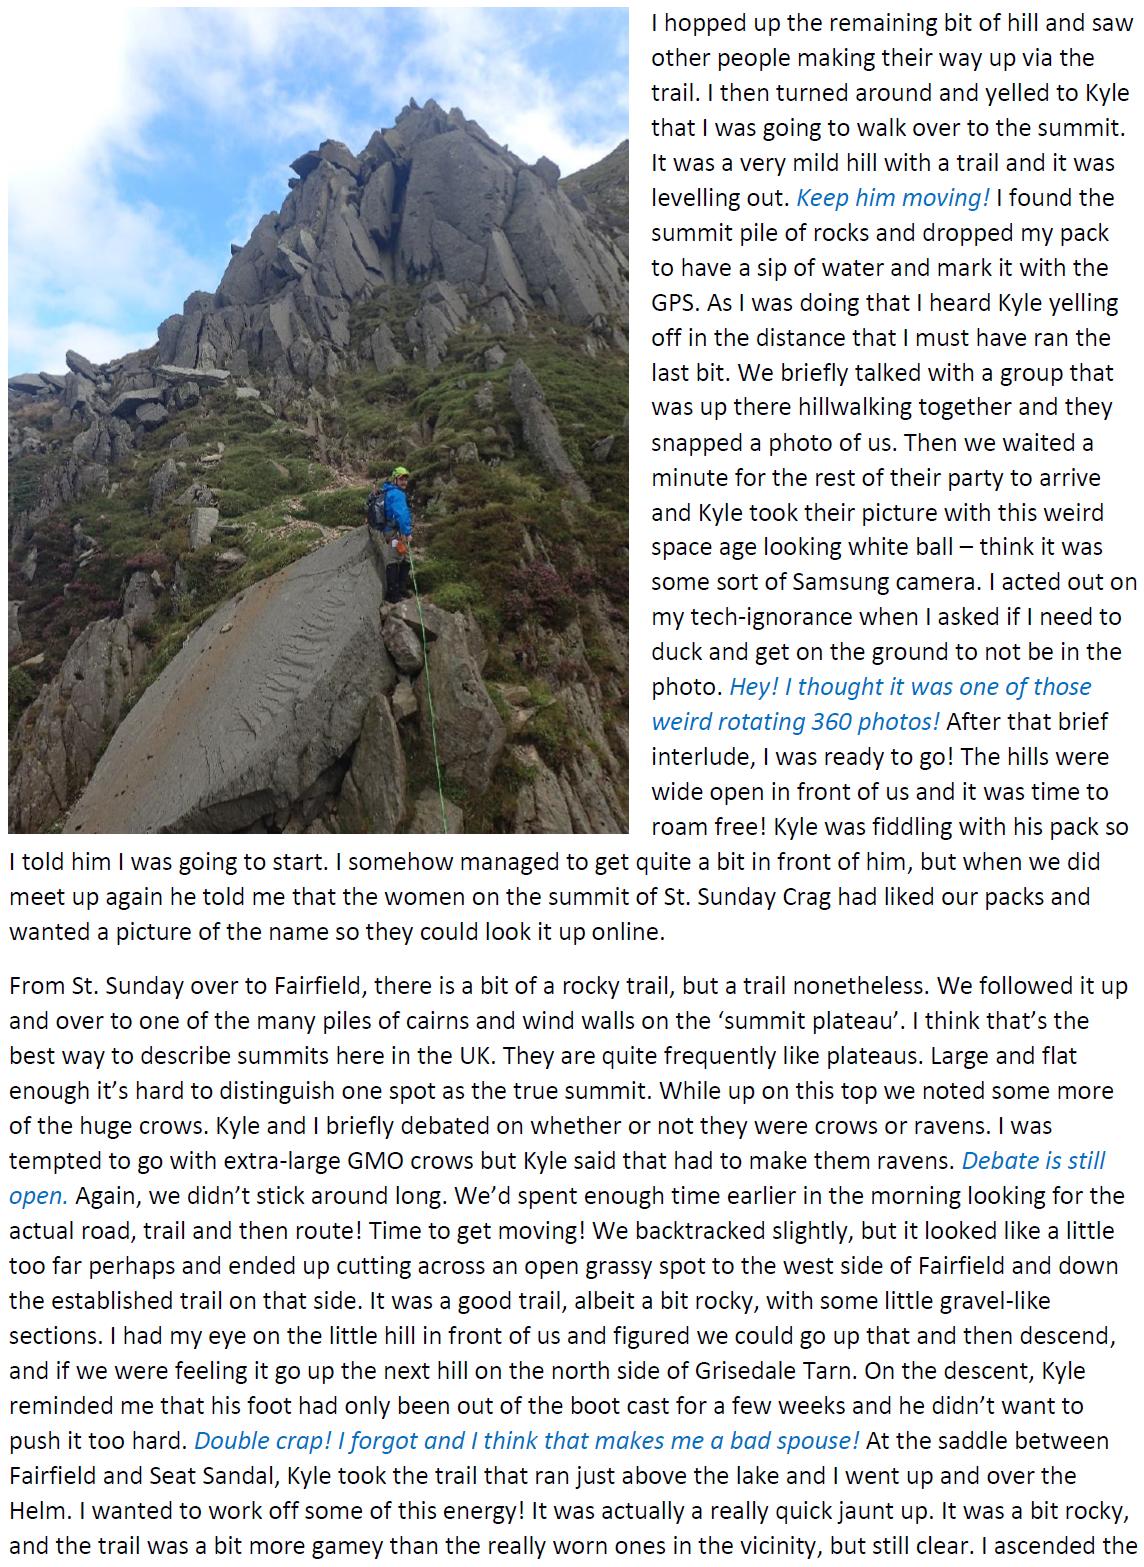 St Sunday Crag (5).PNG